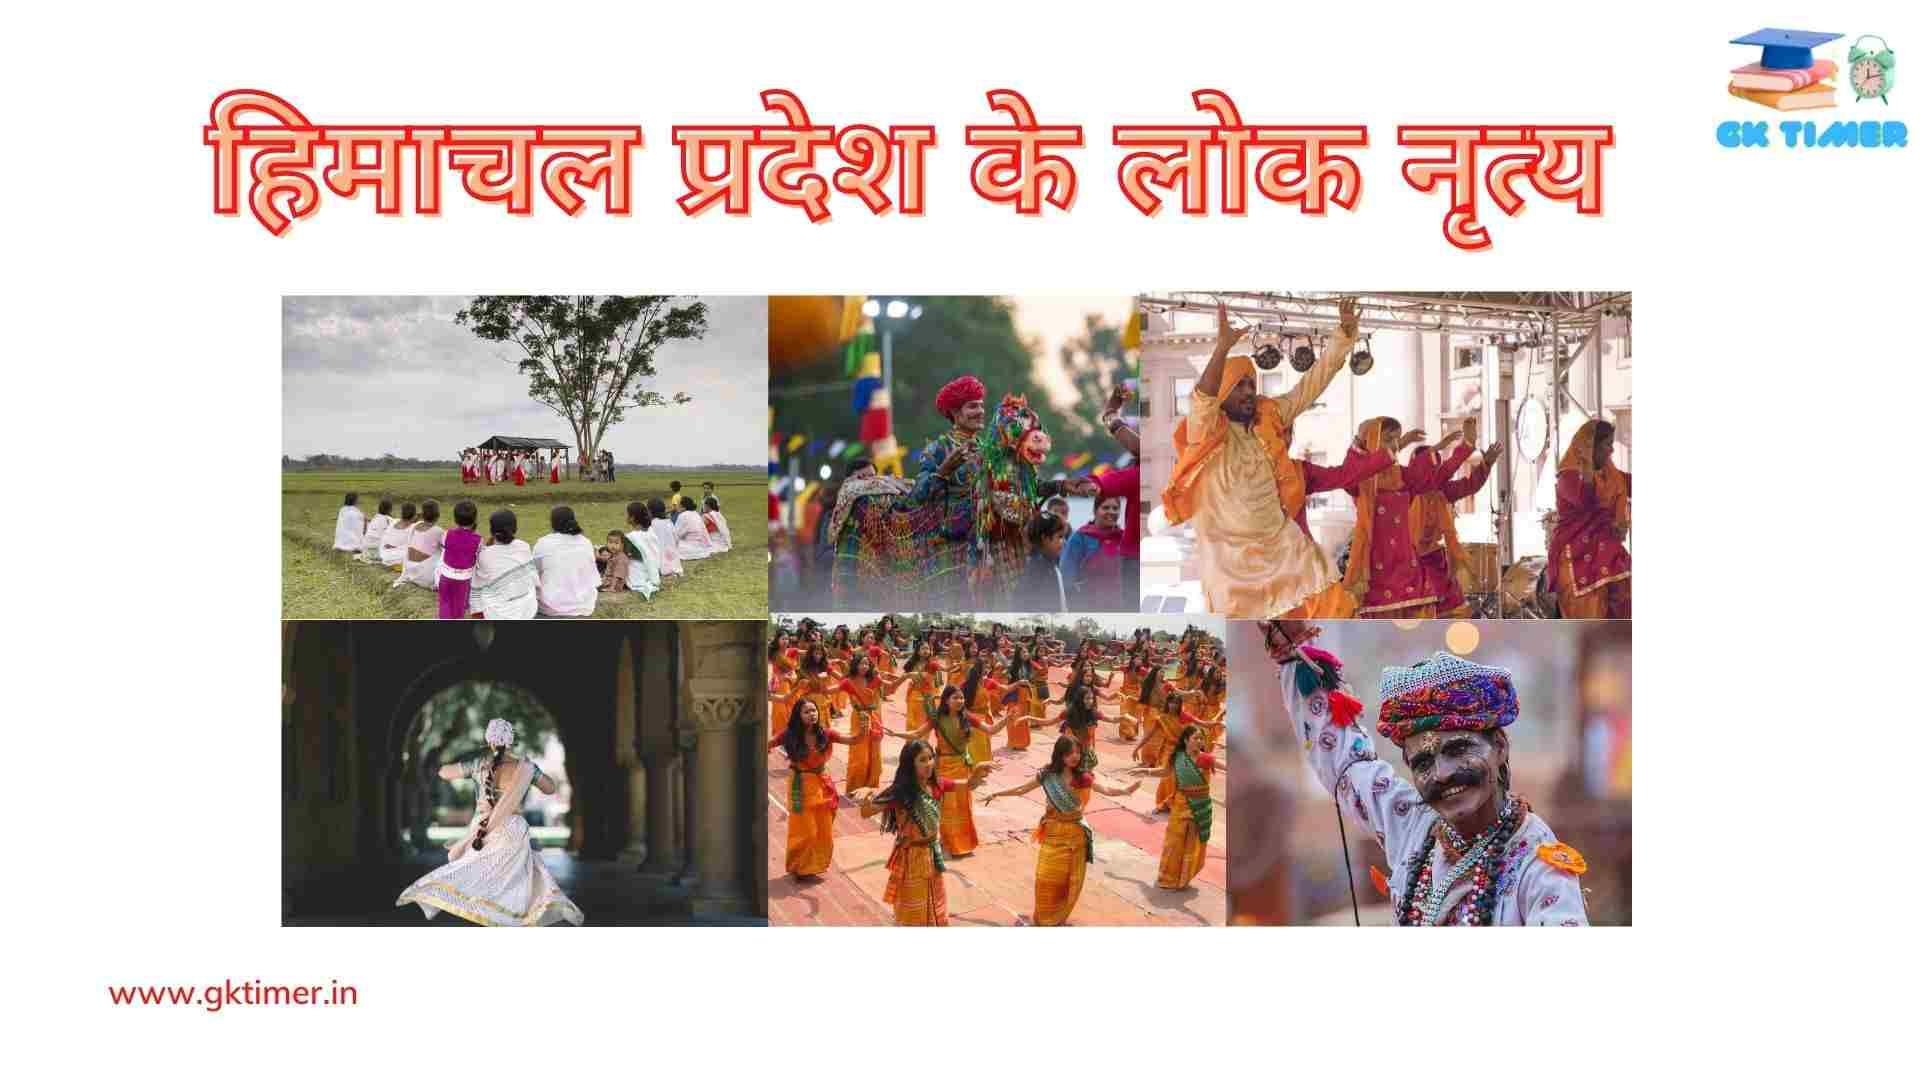 हिमाचल प्रदेश के प्रमुख लोक नृत्य(नाटी, डांगी, कयांग माला, राक्षस नृत्य) | Traditional folk dances of  Himachal Pradesh in Hindi